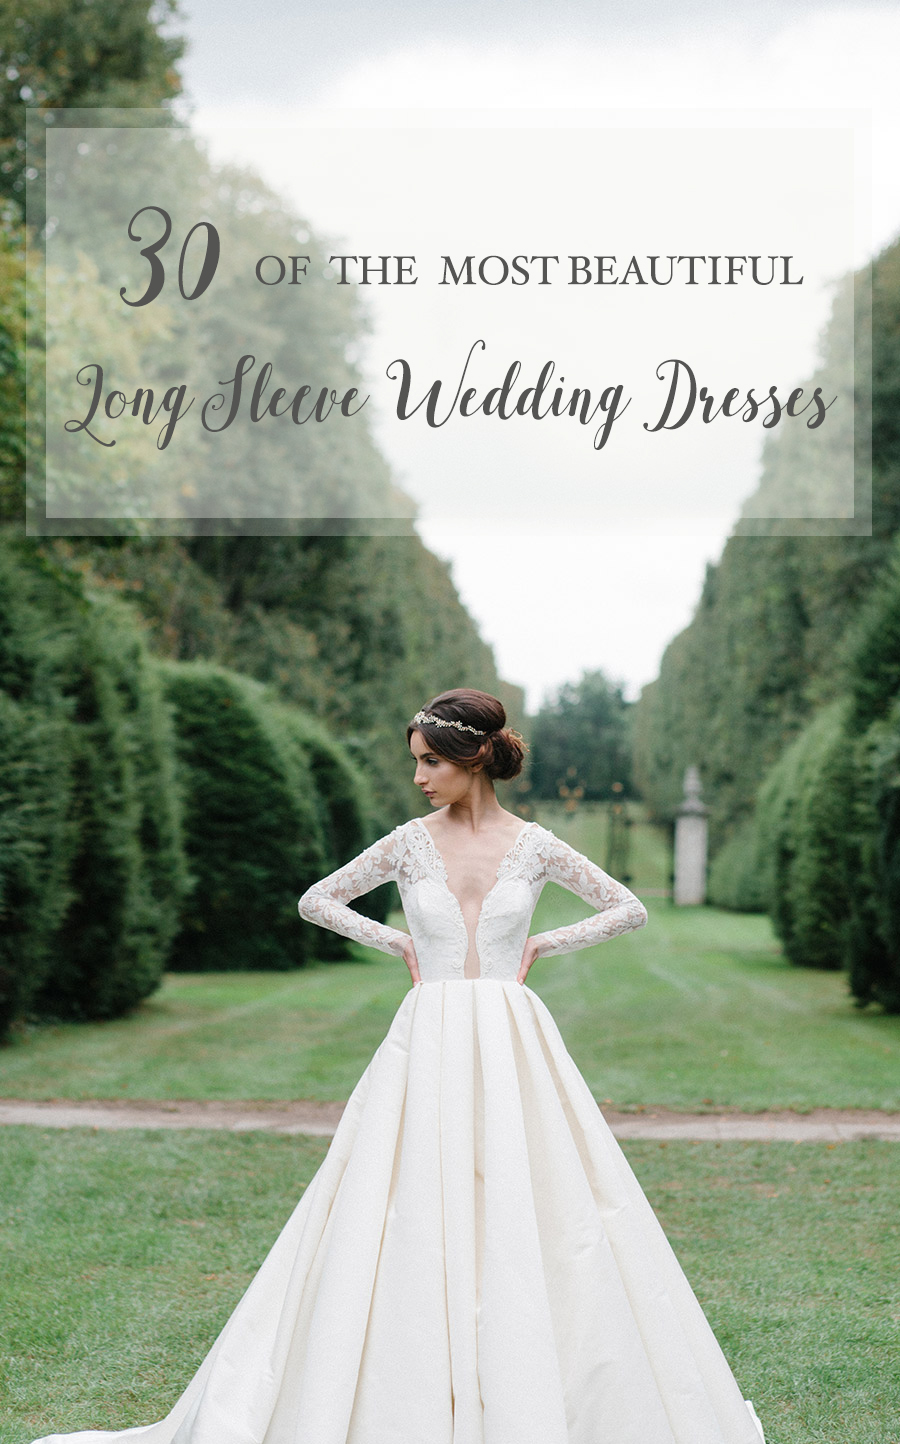 beautiful long sleeved wedding dresses sleeved wedding dress 30 of the most Beautiful Long Sleeve Wedding Dresses for